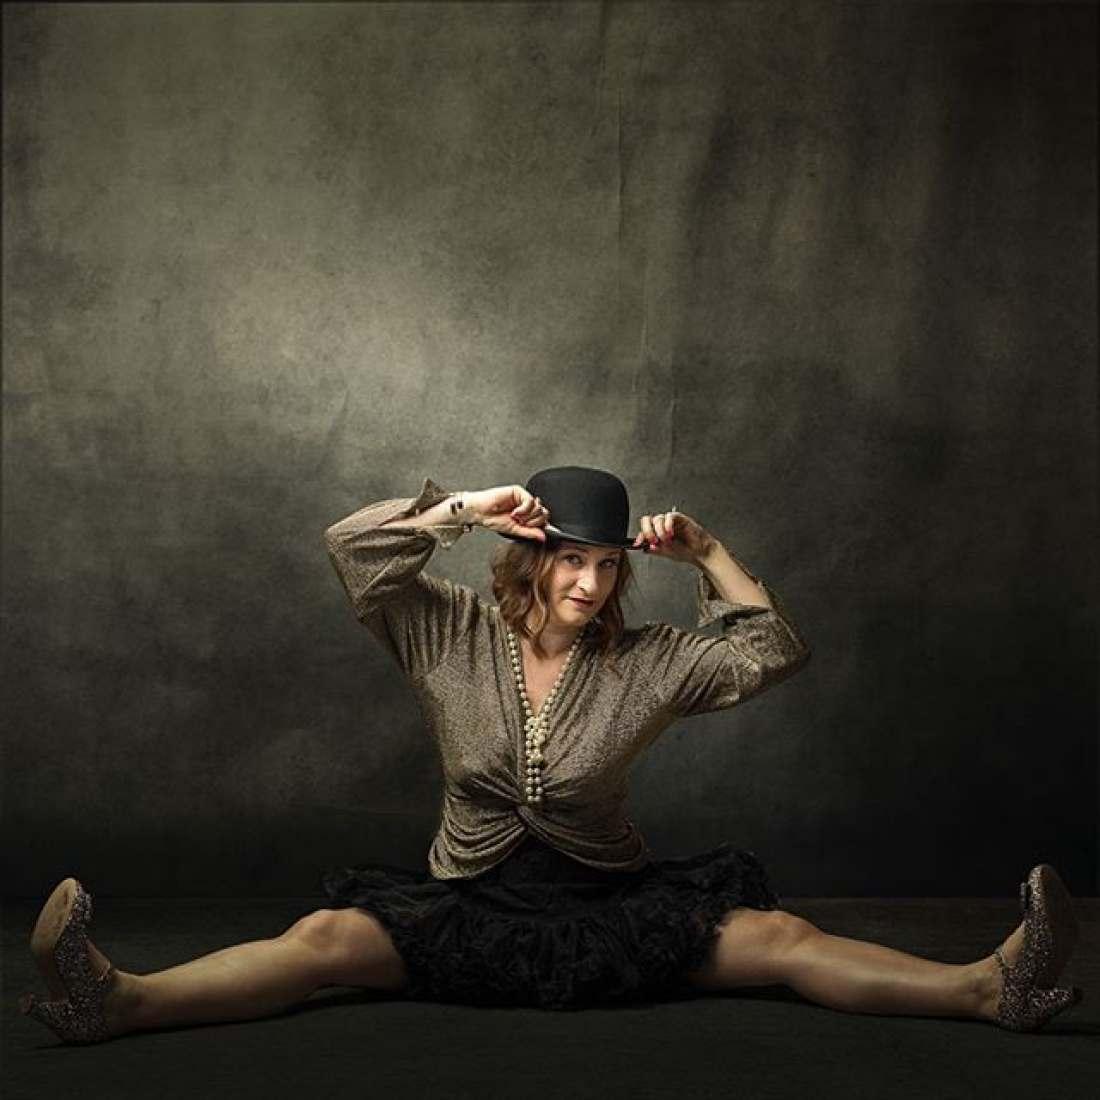 Another shot of Tallulah Goodtimes, amazing DJ @tallulahgoodtimes @cherrypie_makeovers @britvix